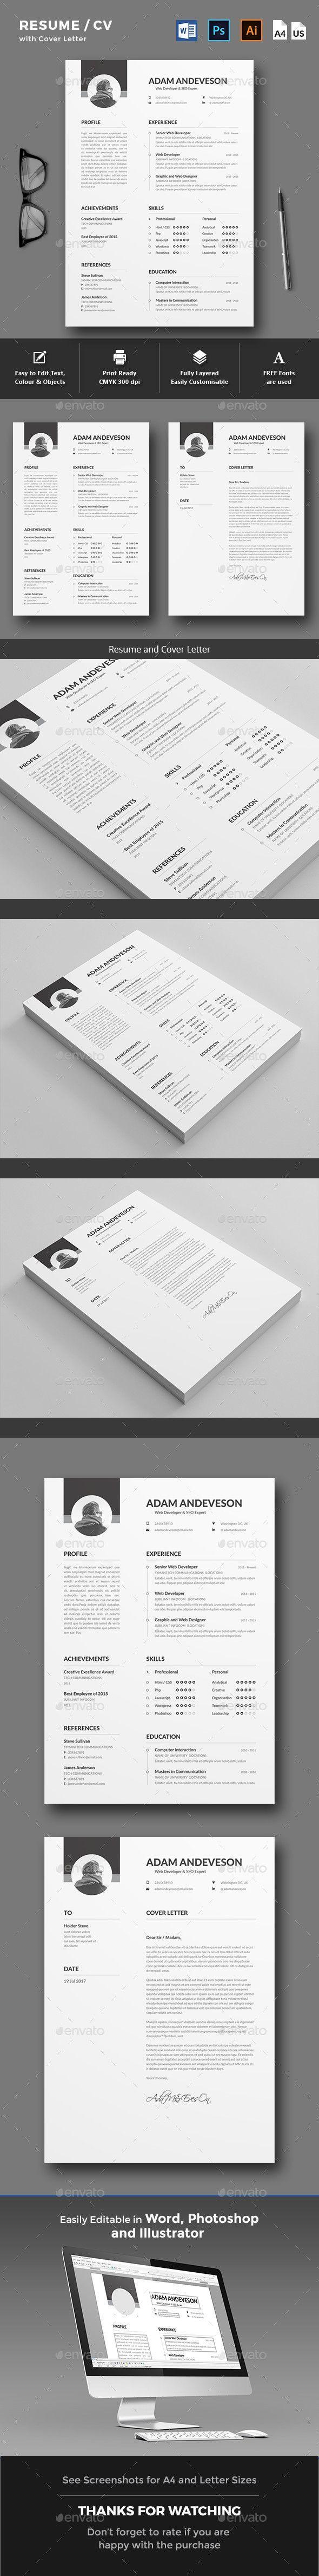 Resume / CV Template PSD, AI, DOCX & DOC